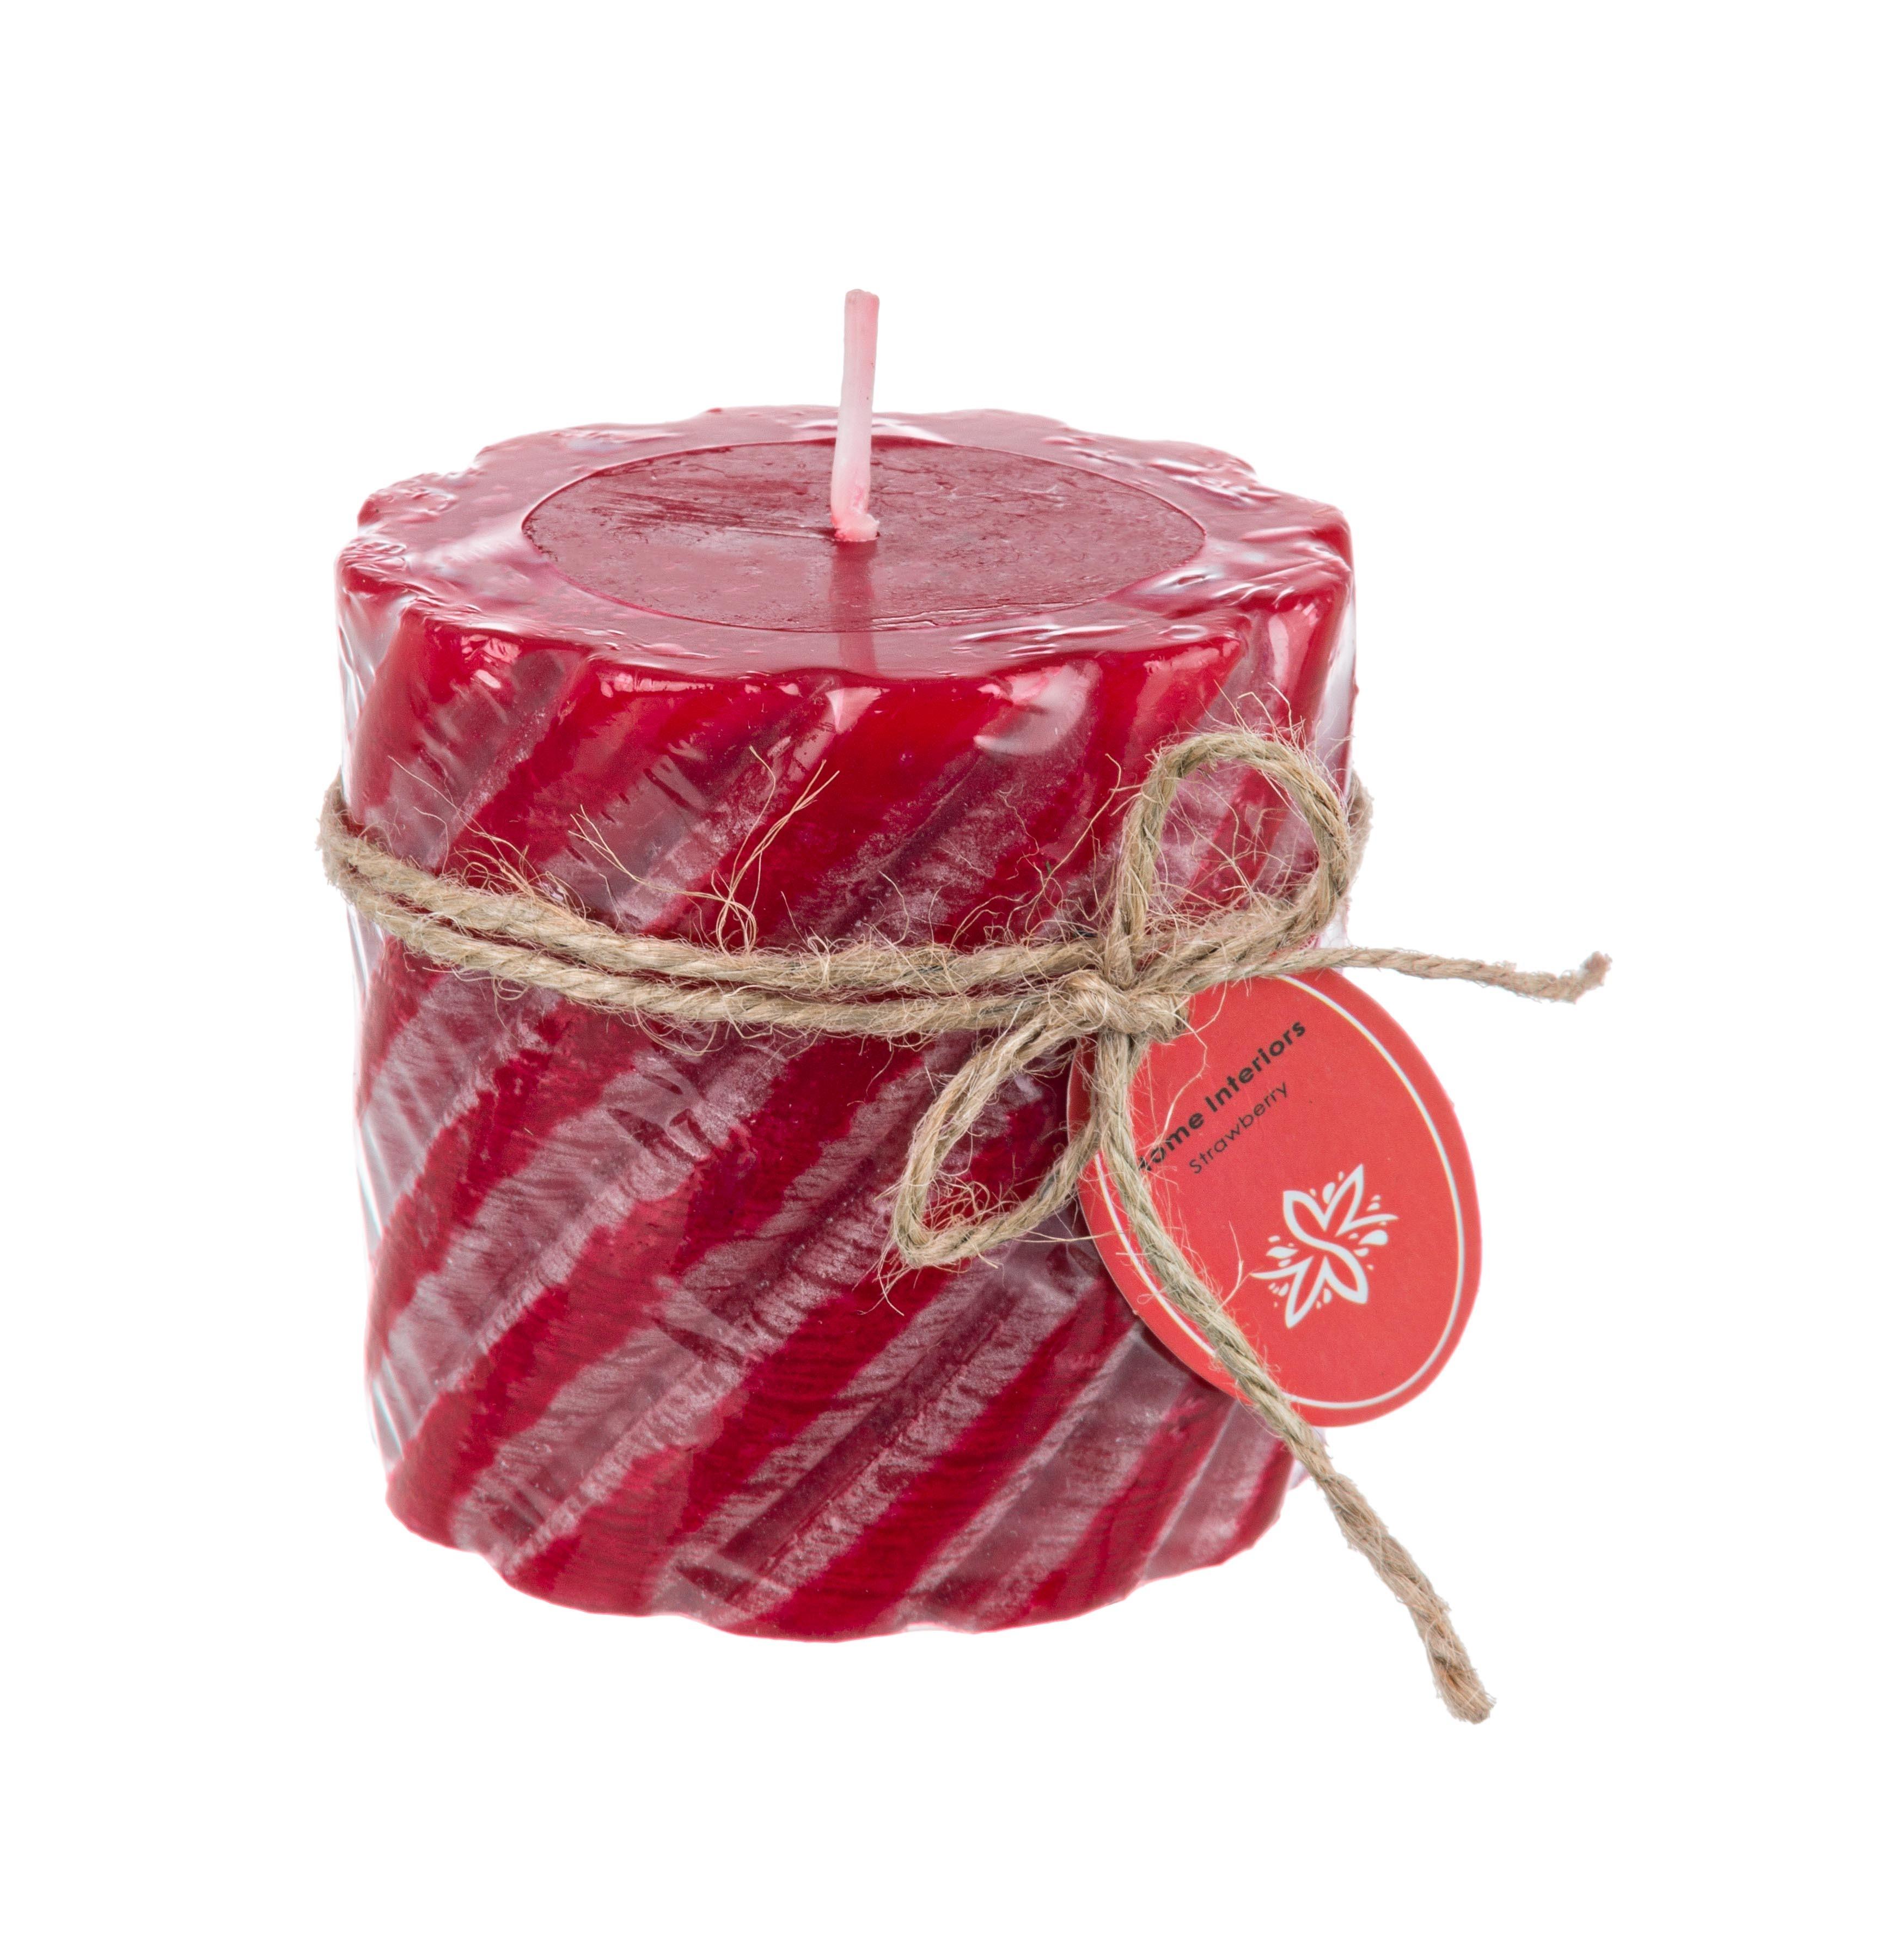 Lumanare parfumata cilindrica Rustica Twist Rosu, Ø7,3xH7,5 cm poza